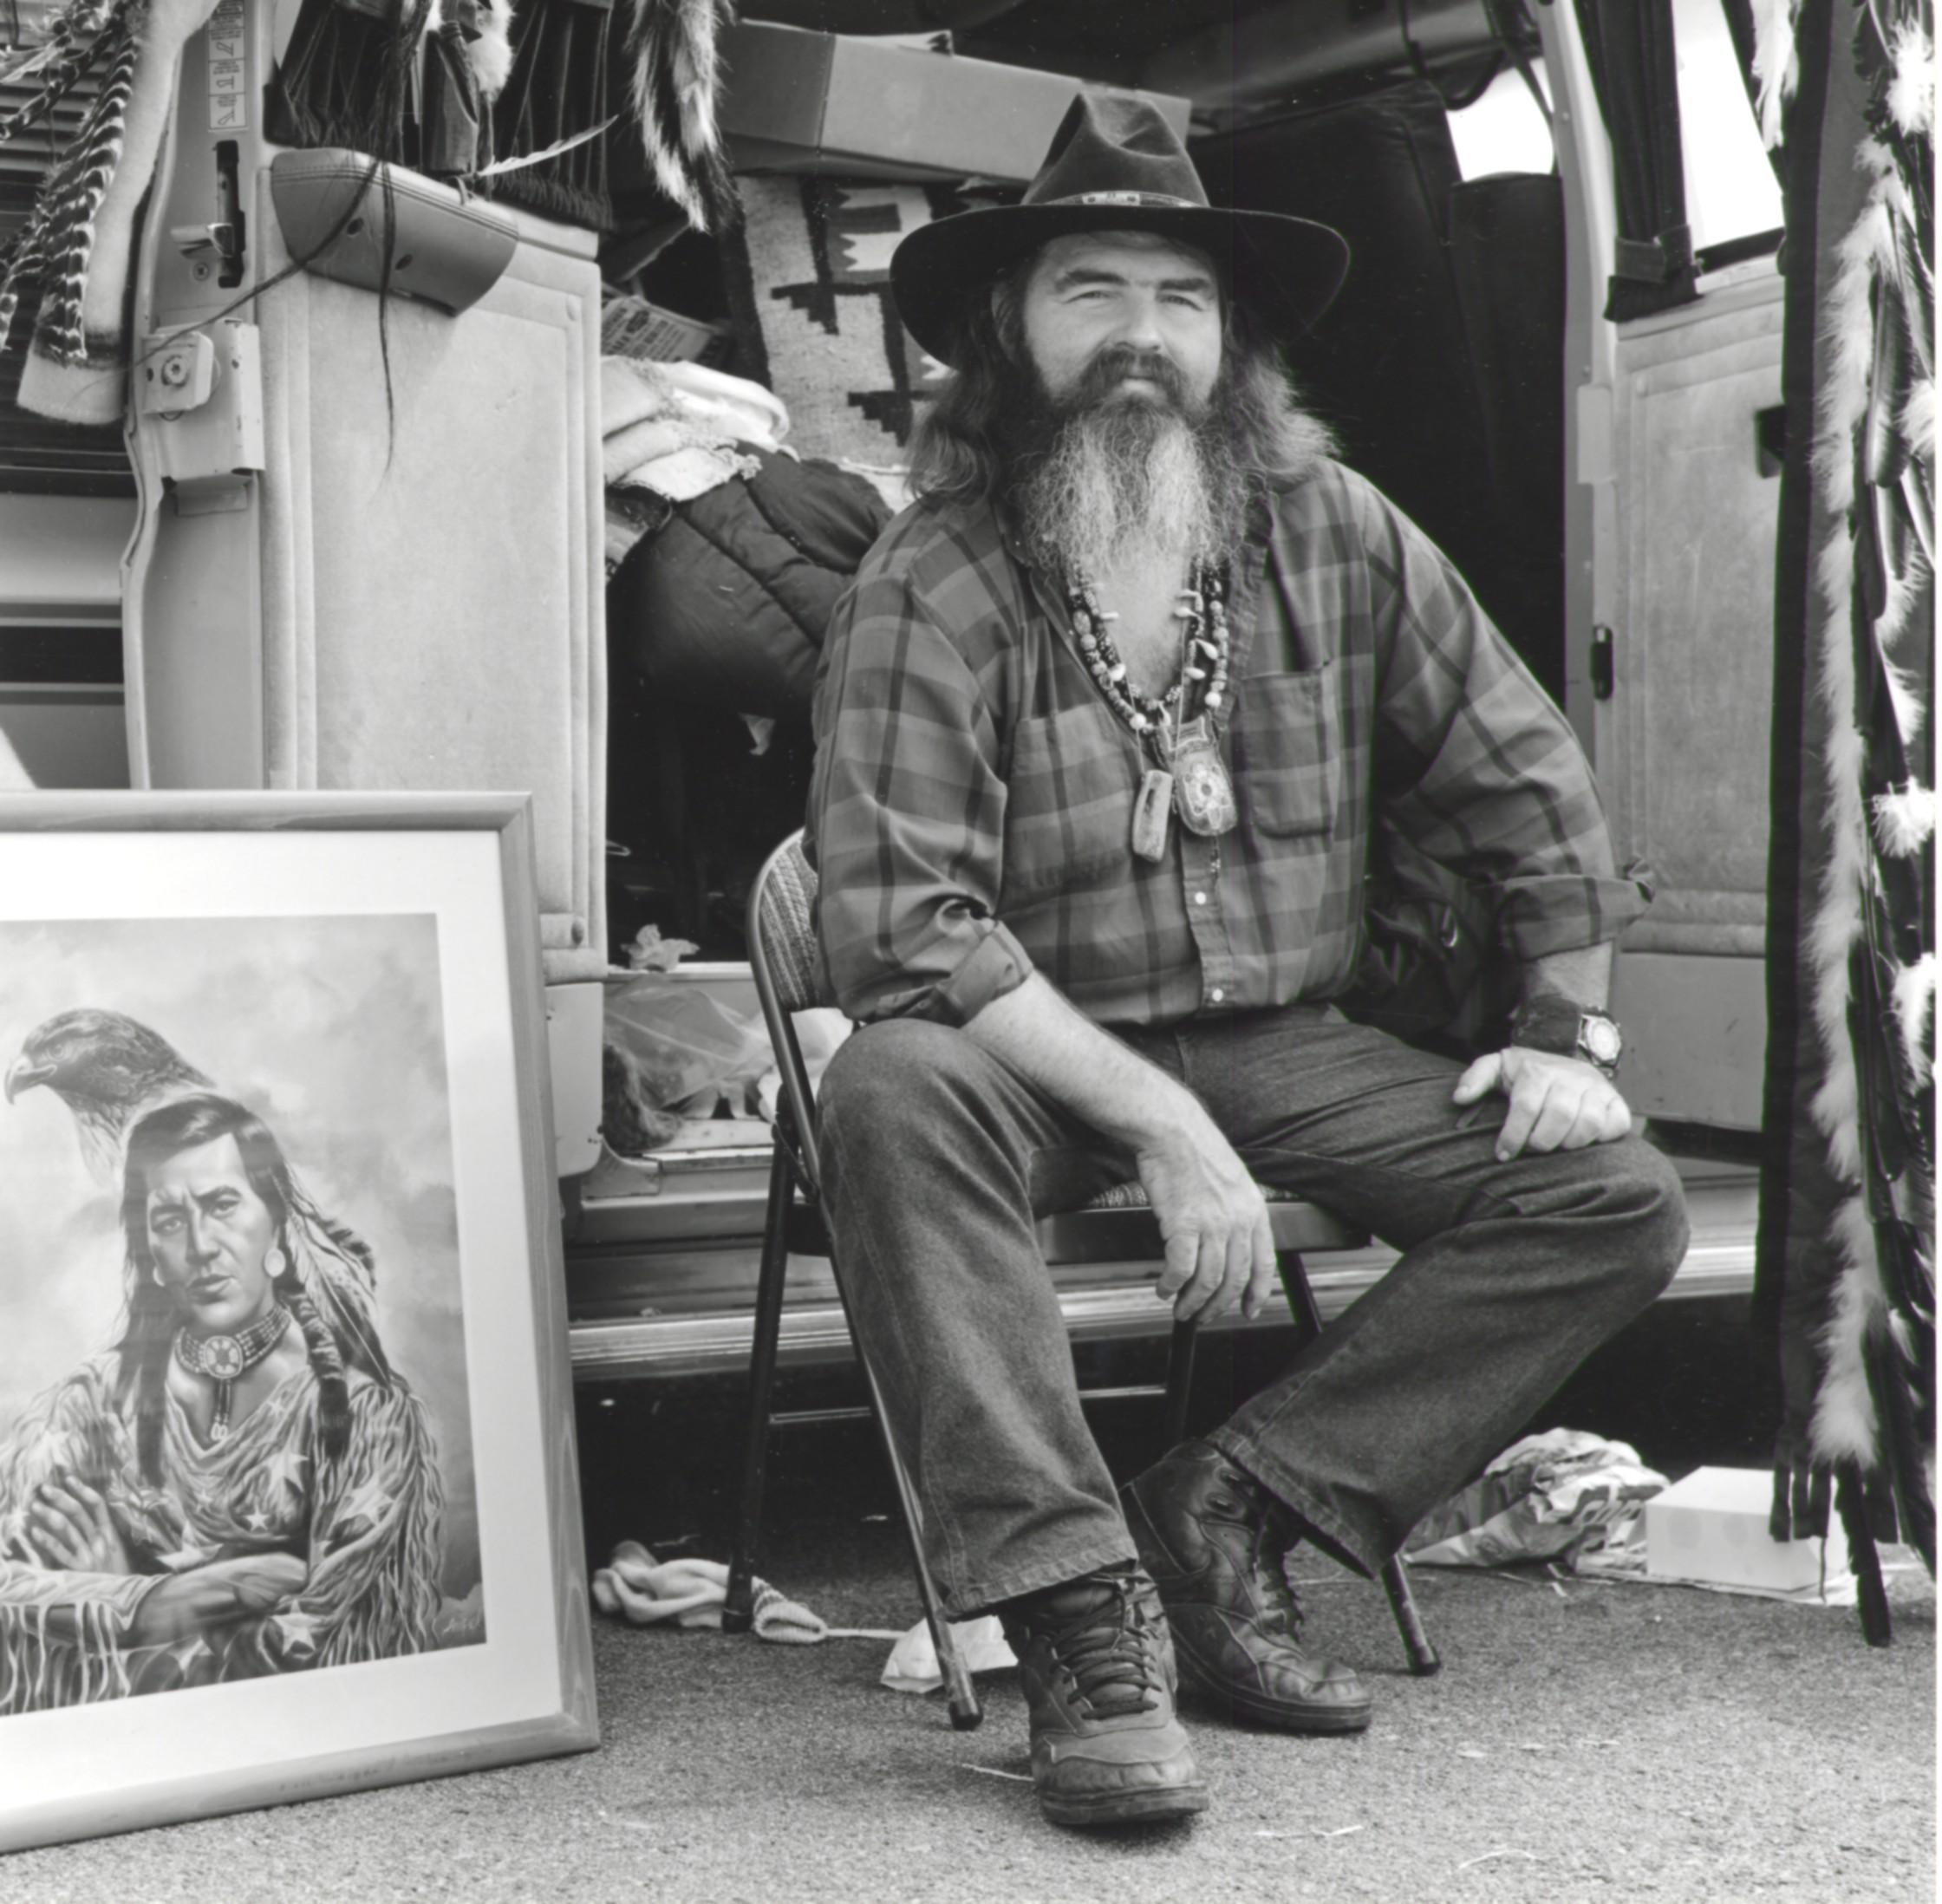 Vendor Selling Western Art - Pasadena CA 1995